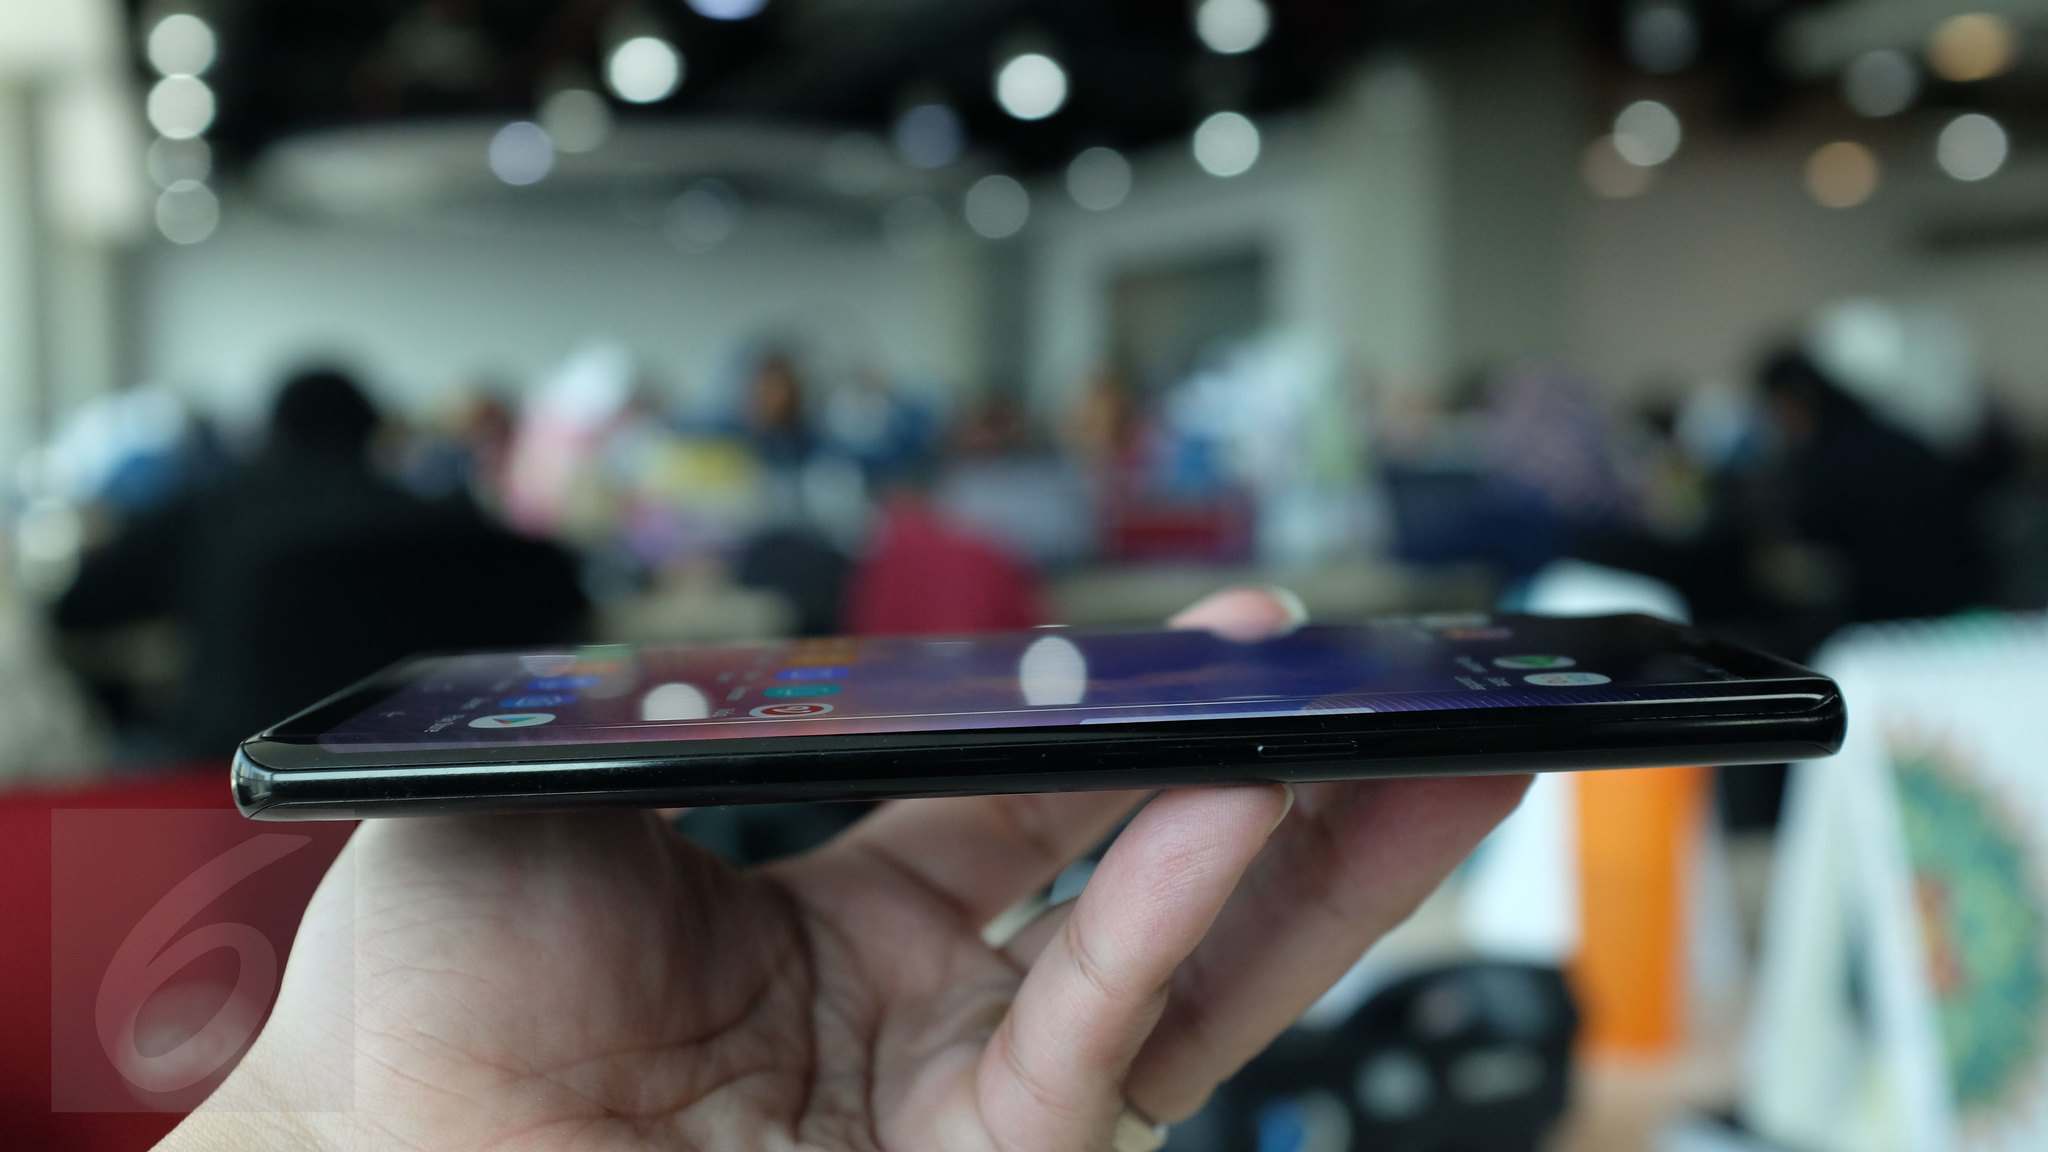 Sisi kanan Galaxy Note 8. Liputan6.com/ Iskandar